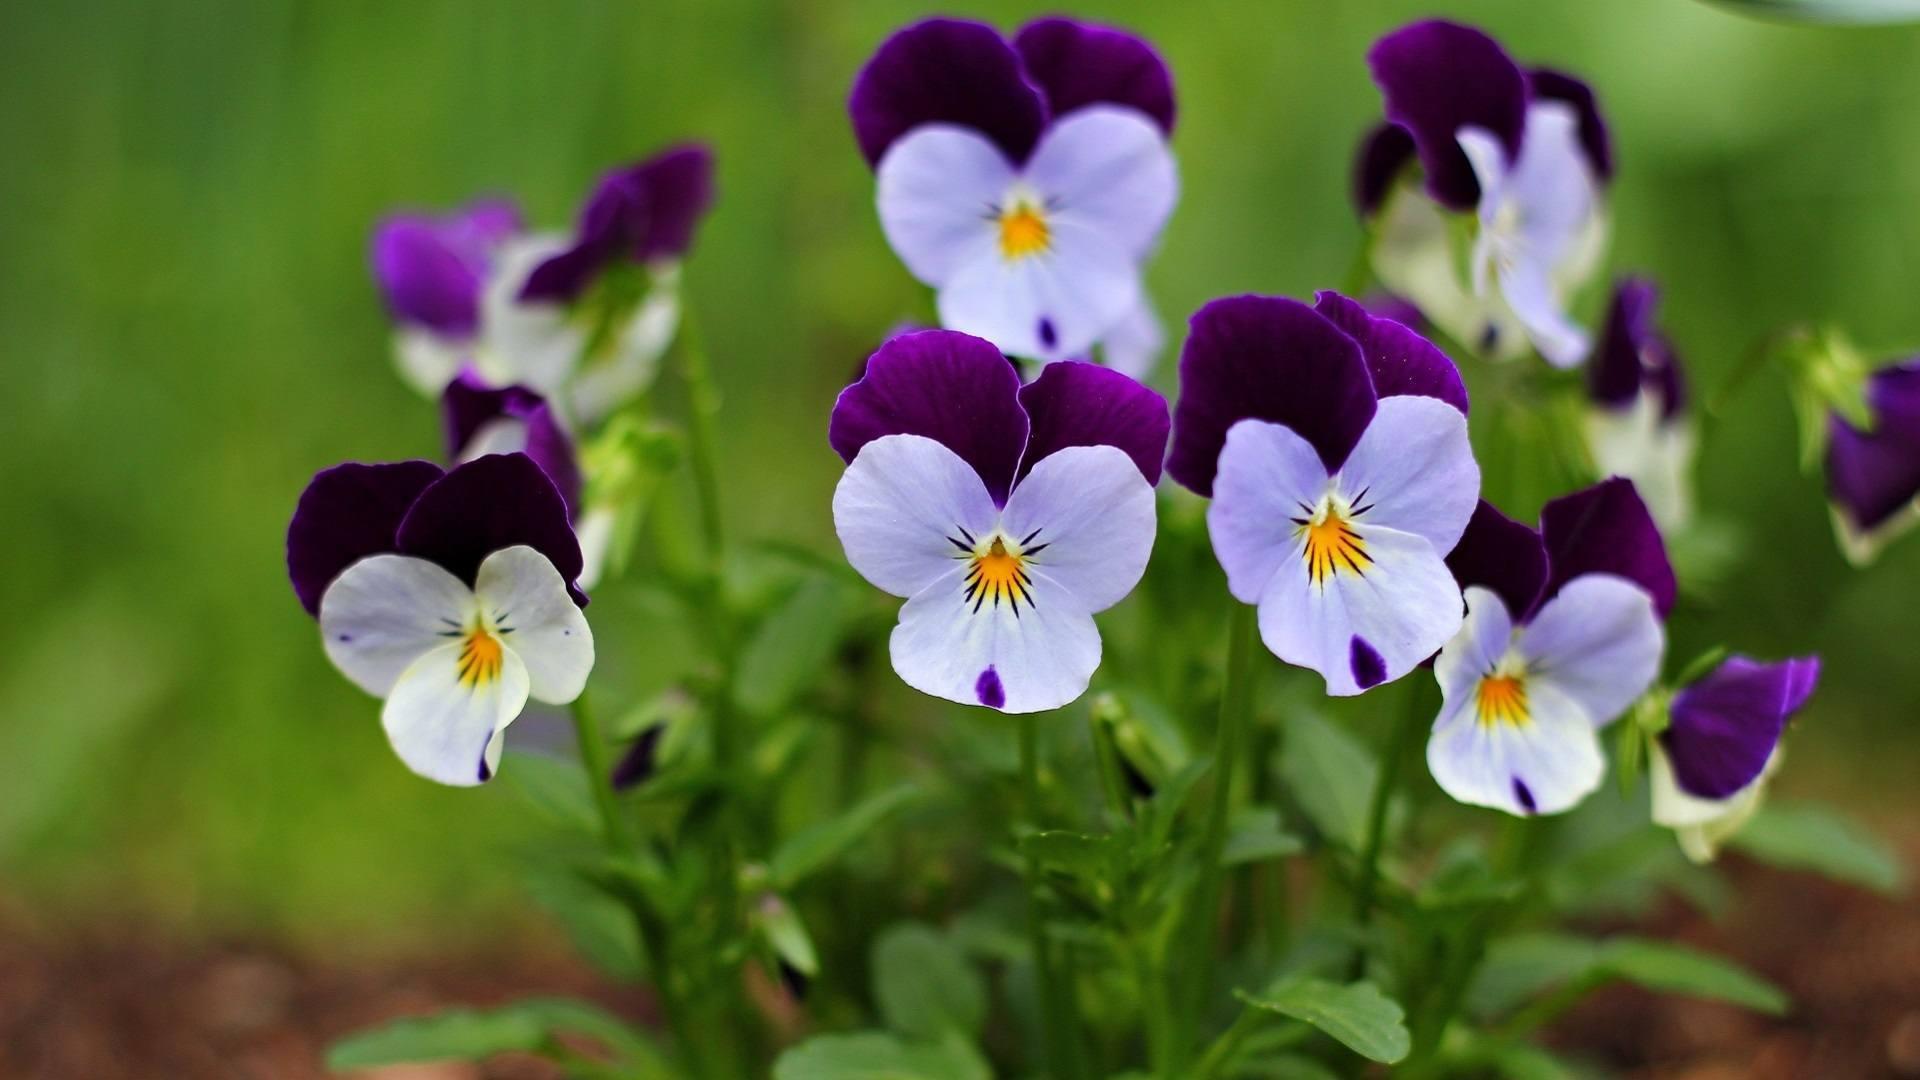 http://getbg.net/upload/full/www.GetBg.net_Nature___Flowers_Small_beautiful_flowers_pansy_065947_.jpg